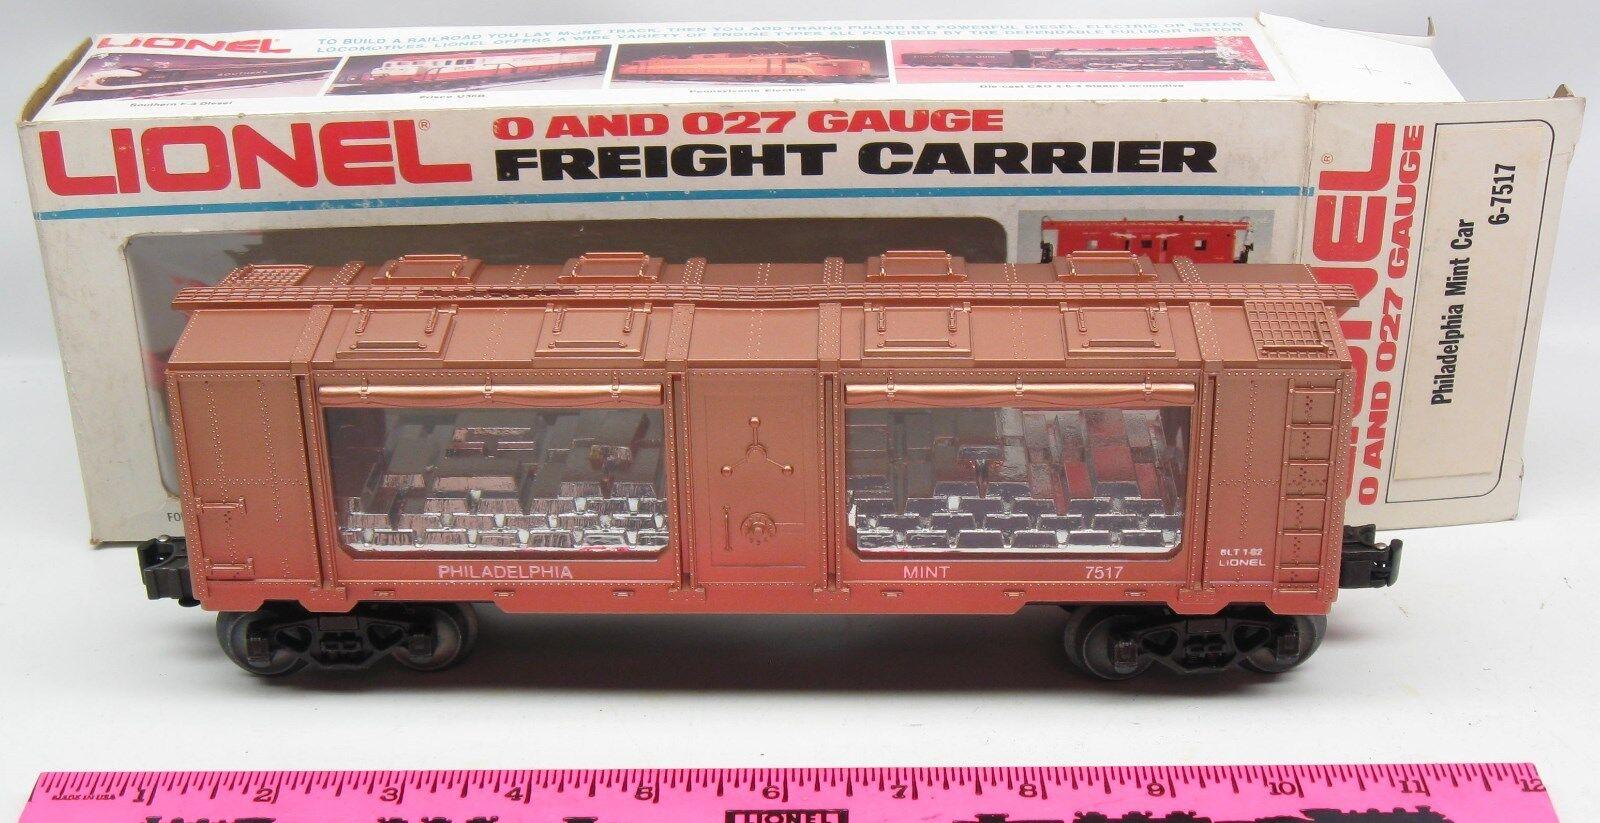 Lionel 6-7517 Philadelphia Mint car